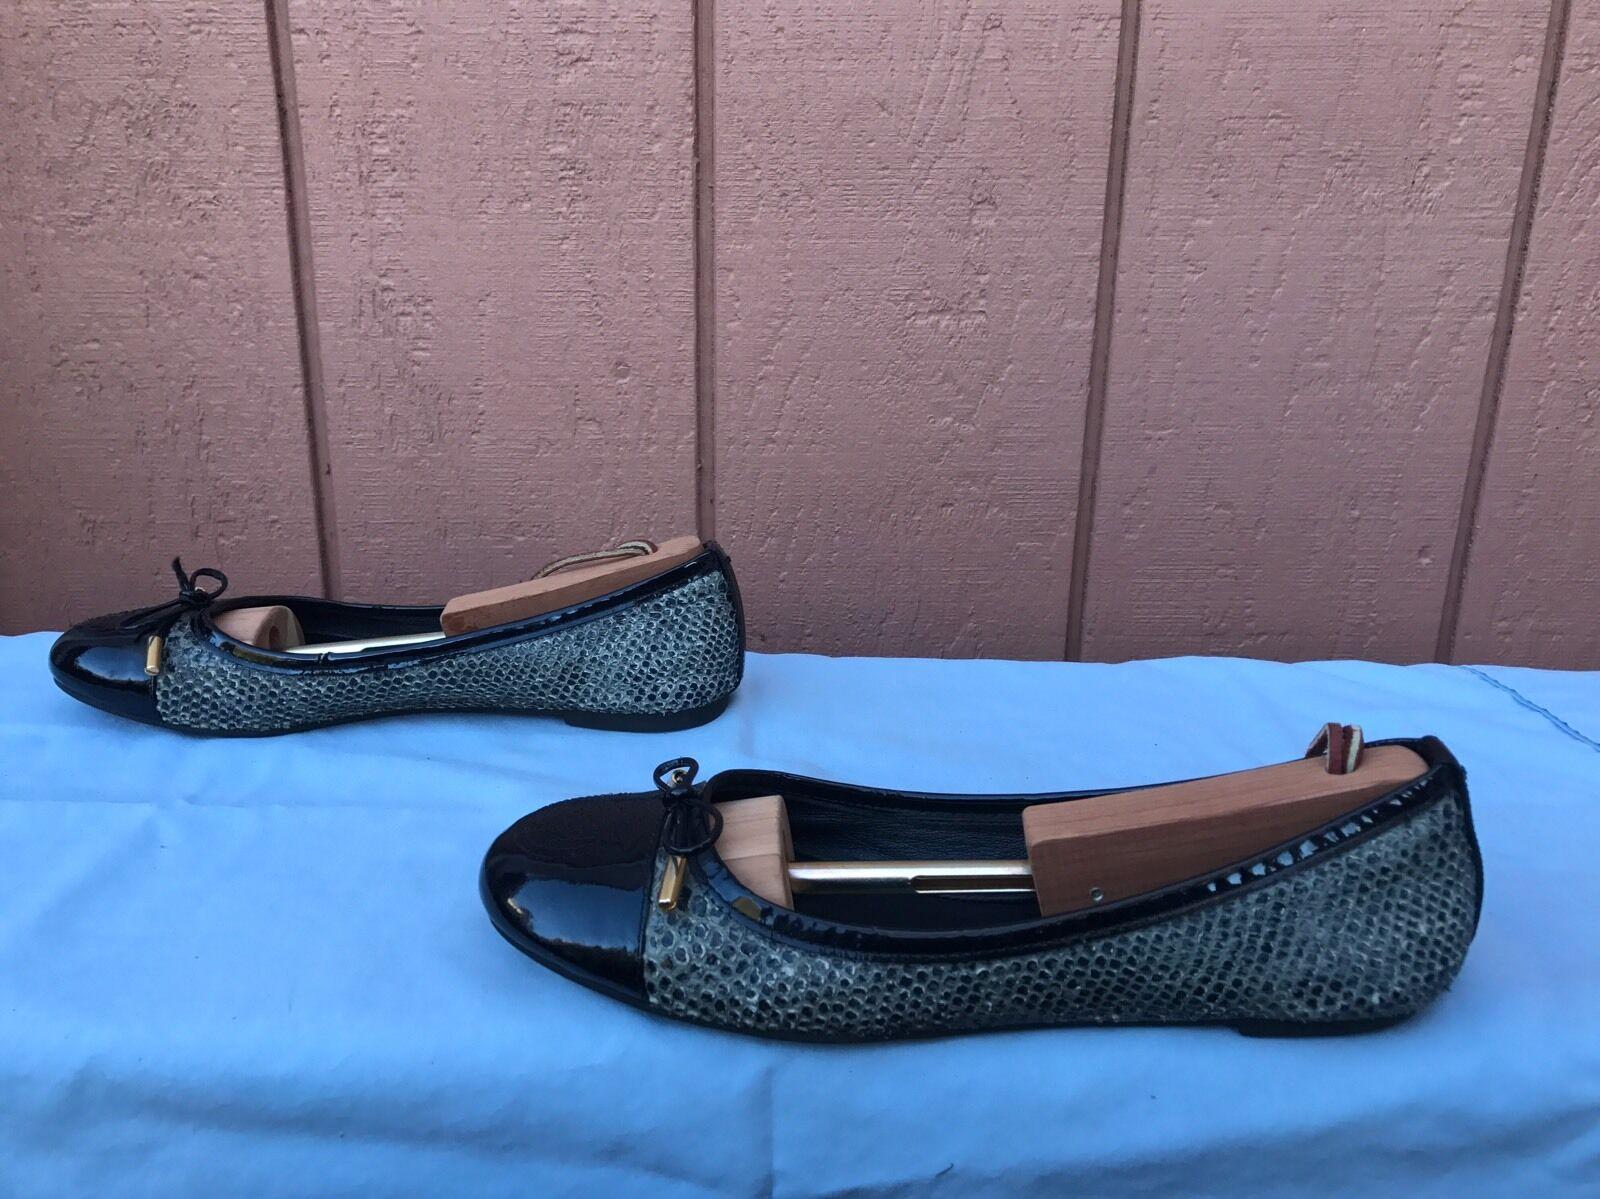 Tory Burch Toe Silver Snake Skin Cap Toe Burch Ballet Flats Schuhes Leder US 8 M bba4ec